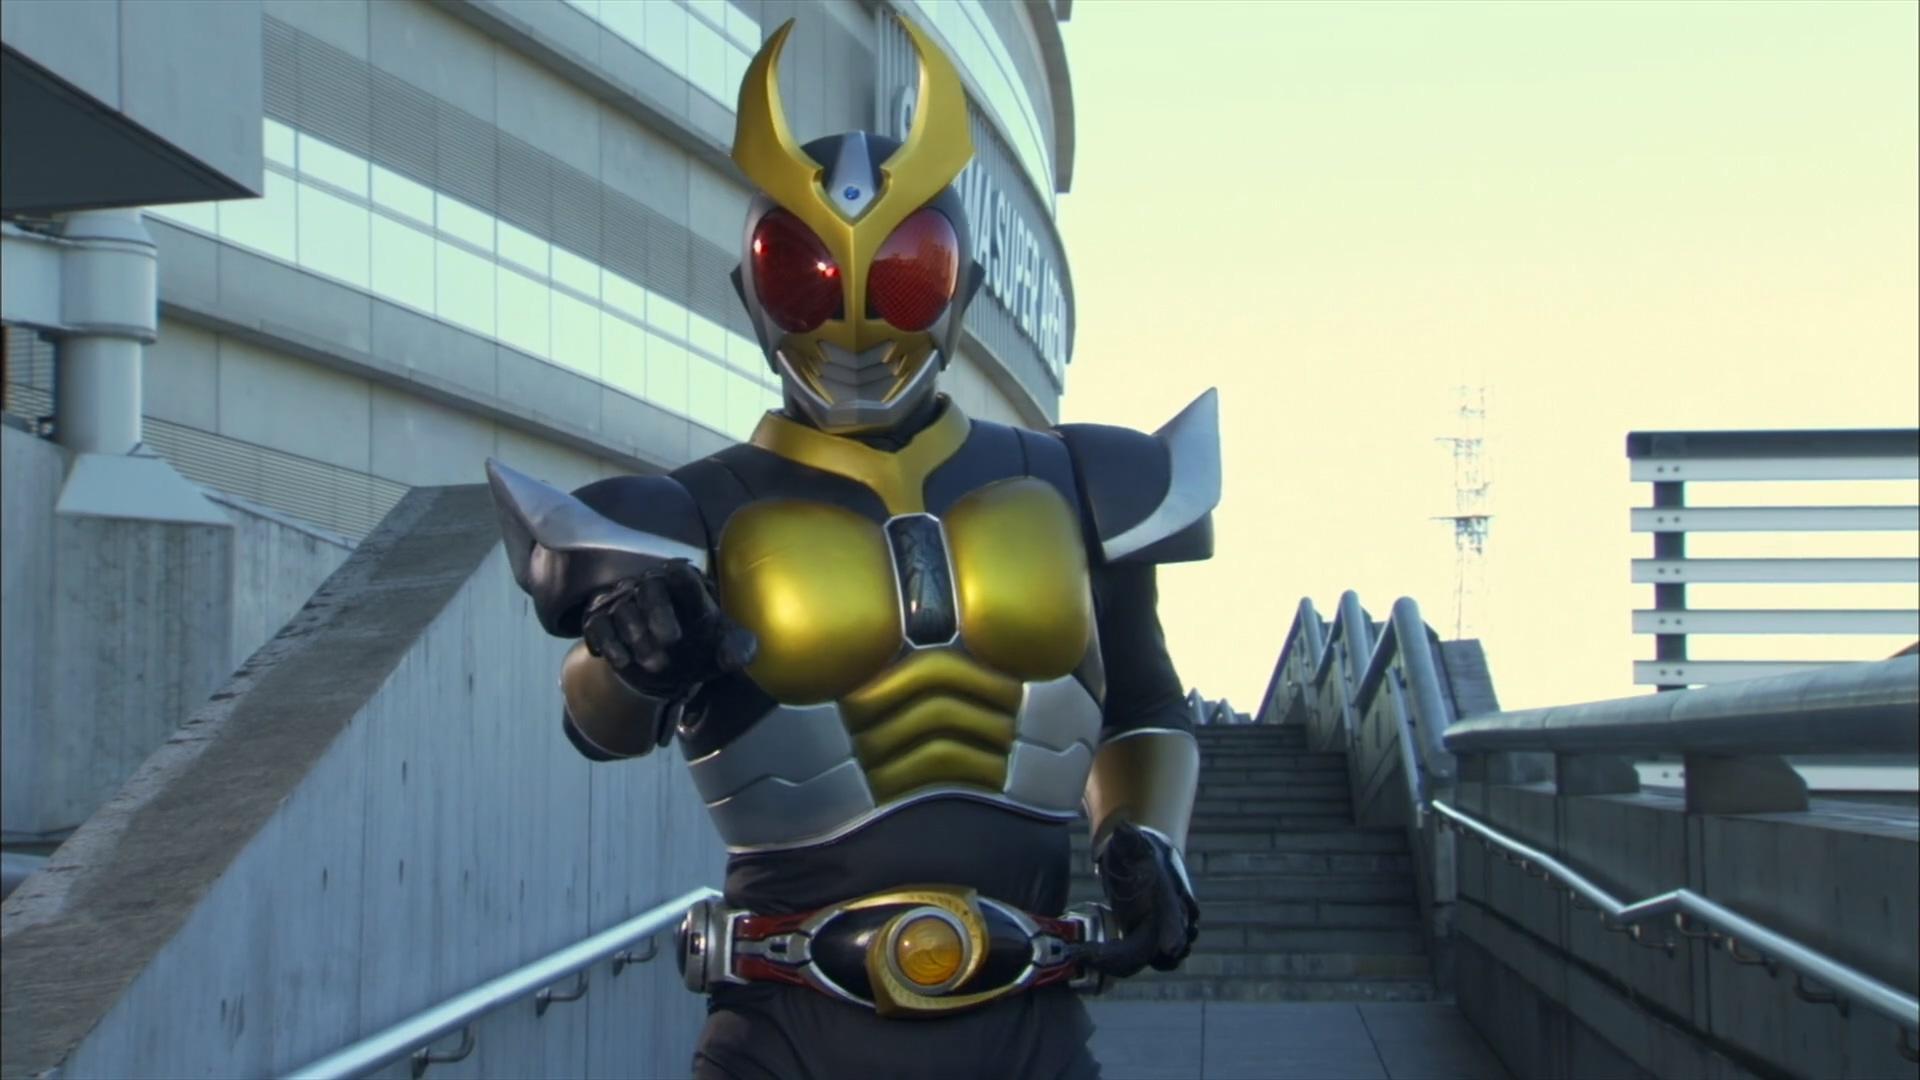 http://vignette1.wikia.nocookie.net/kamenrider/images/5/59/Agito_(Let's_Go_Kamen_Riders).jpg/revision/latest?cb=20120613174528